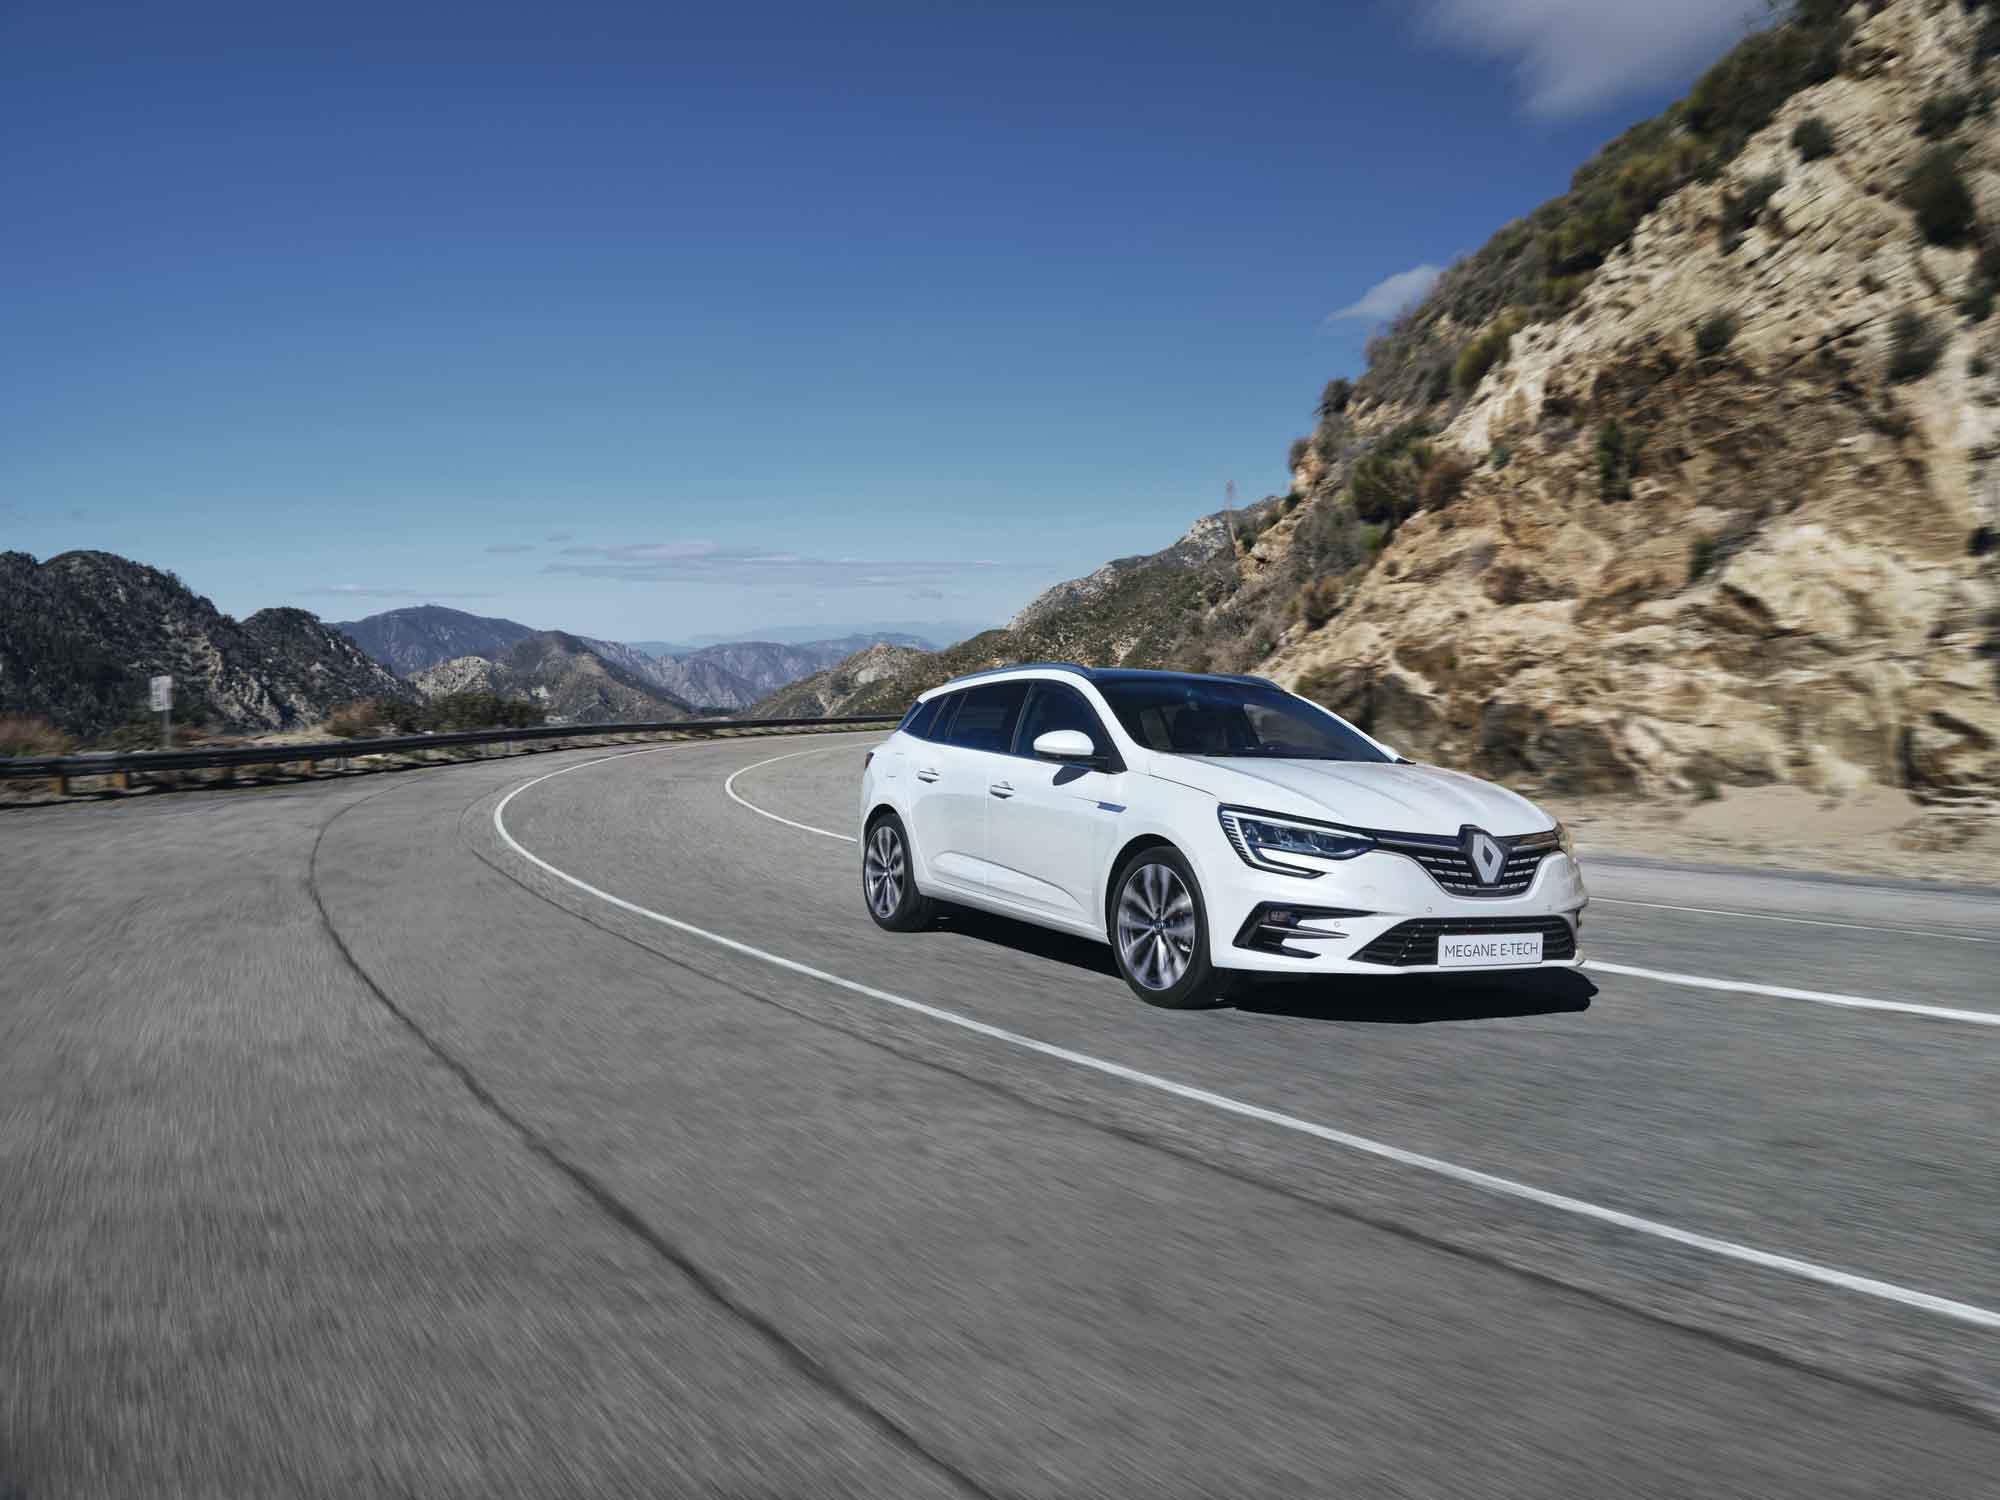 Renault Mégane E-TECH Plug-in : l'hybride rechargeable polyvalente